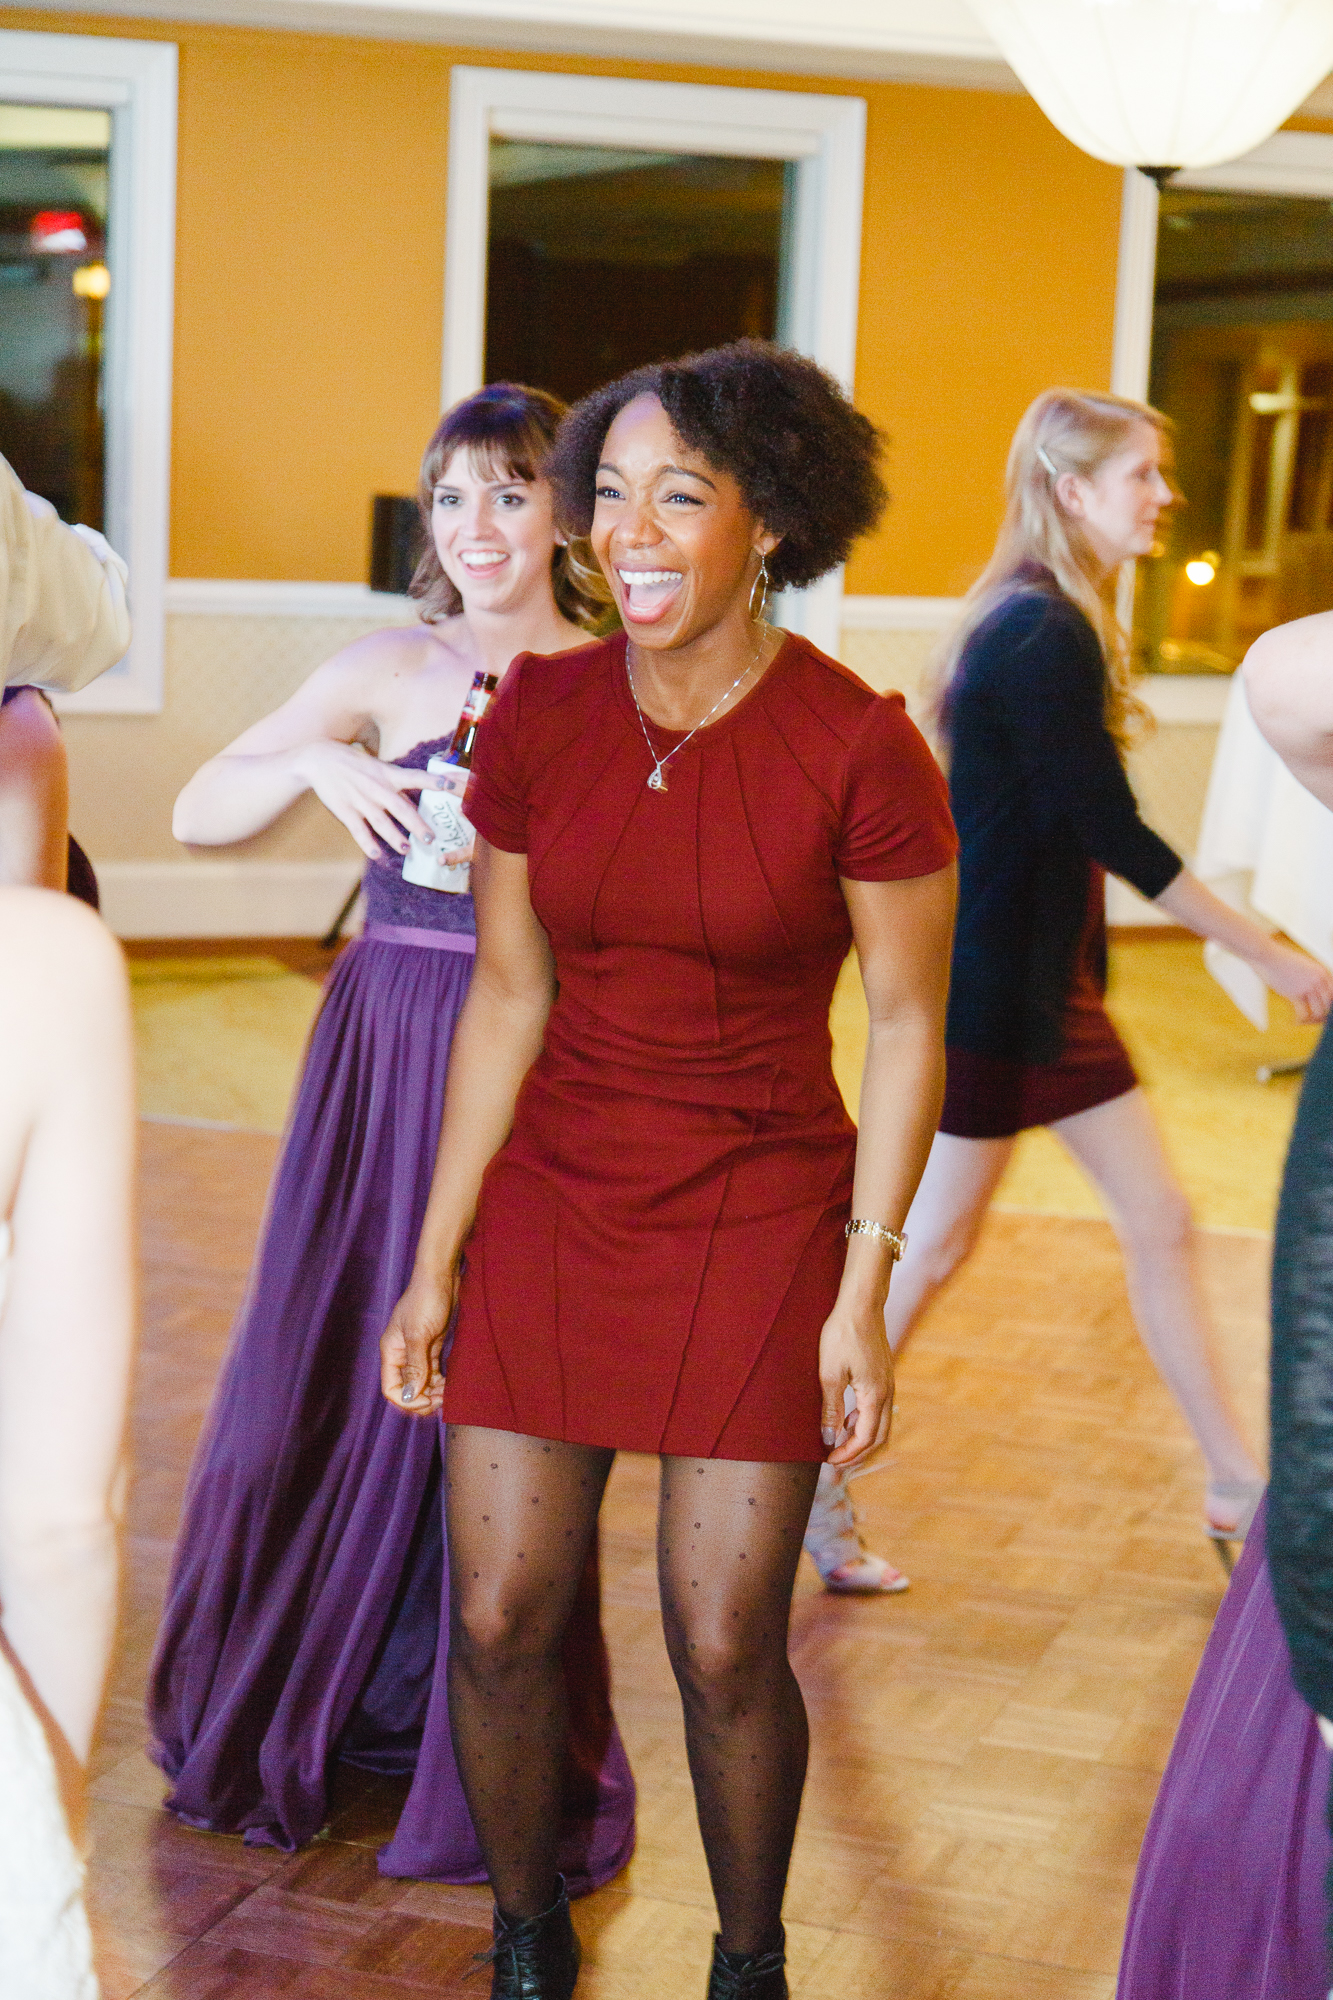 brady-first-dance-dancing-dance-off-kids-ohio-lighting-ocf-columbus-wedding-couple-bridal-creekside-conference-indoor-roxanna-sue-photos-ohio-photography-1.jpg